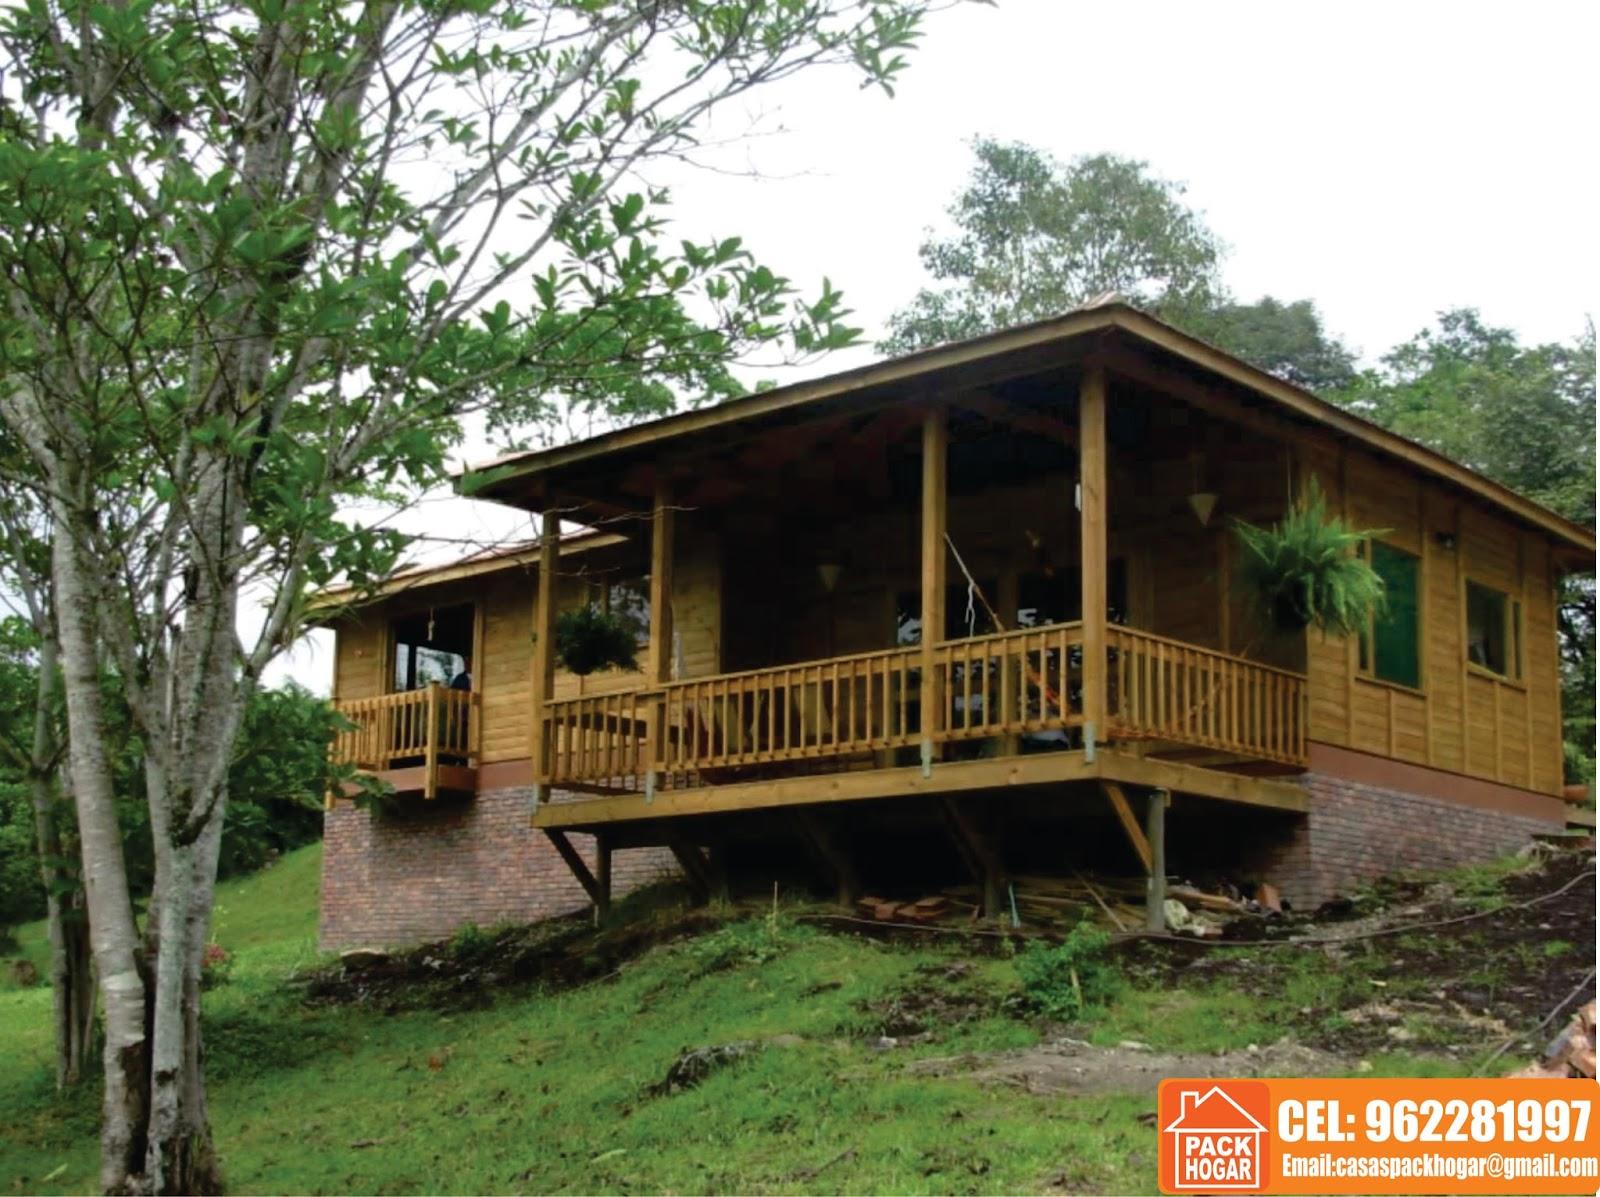 Modelos de bungalows rusticos packhogar - Fotos de bungalows de madera ...